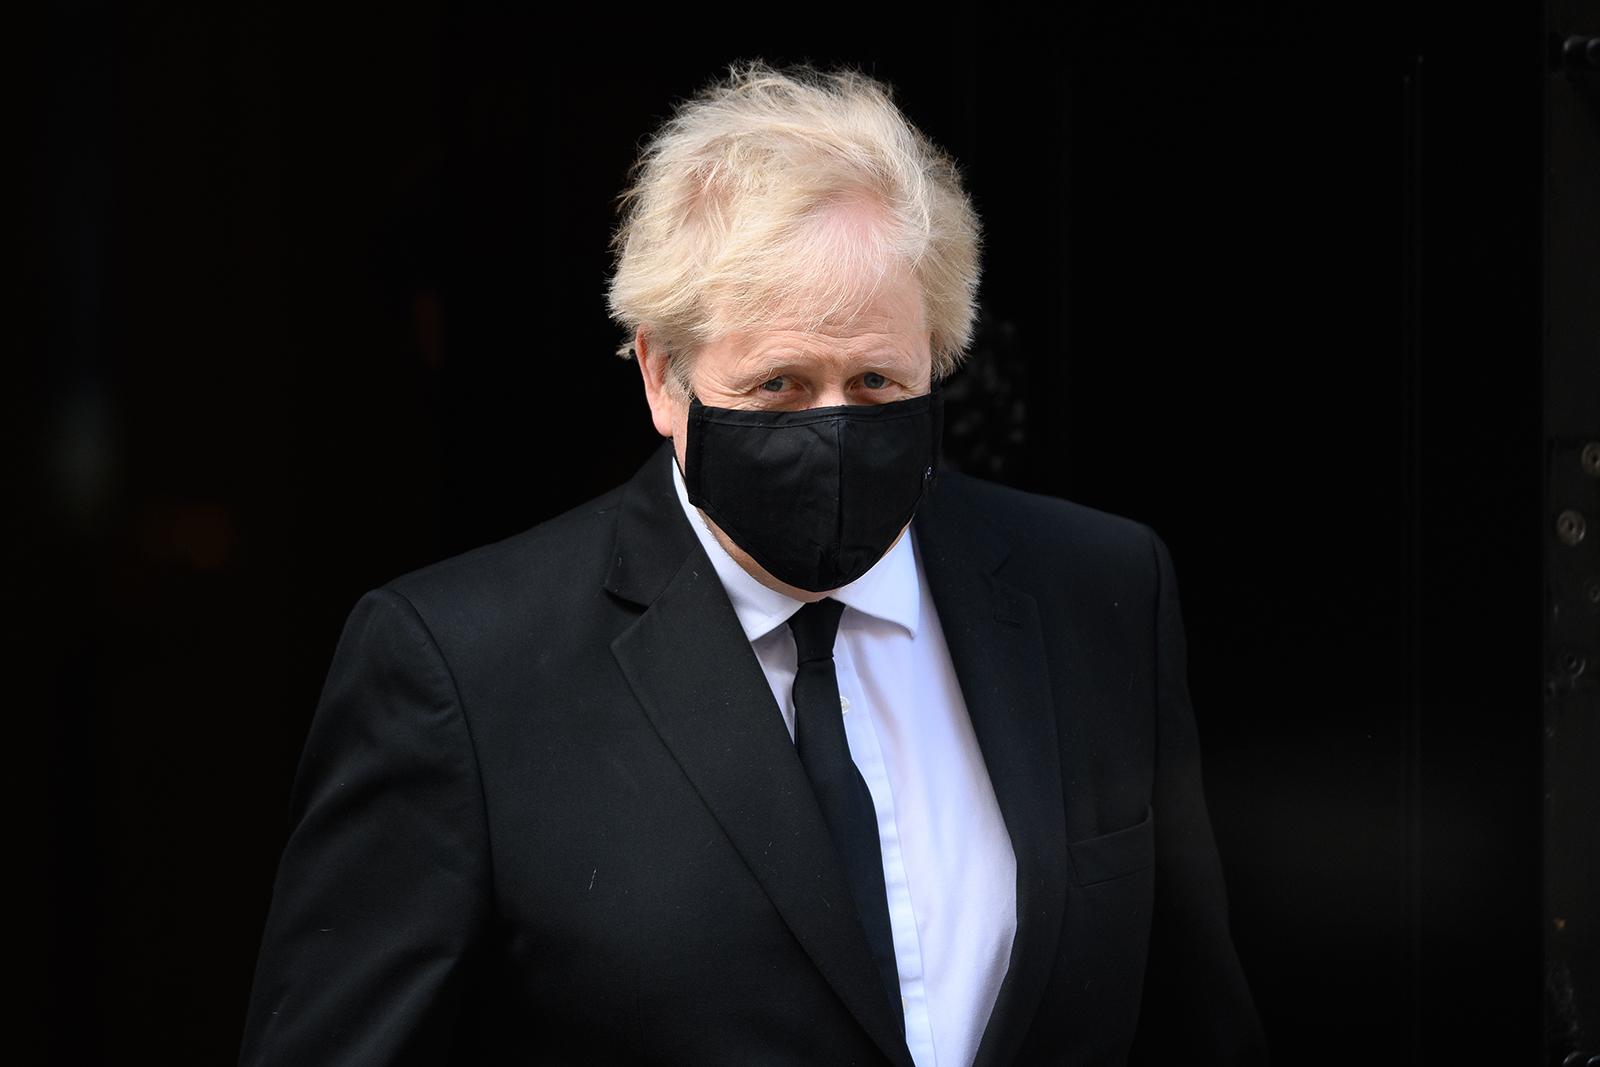 Prime Minister Boris Johnson leaves number 10, Downing Street in London, on April 12.